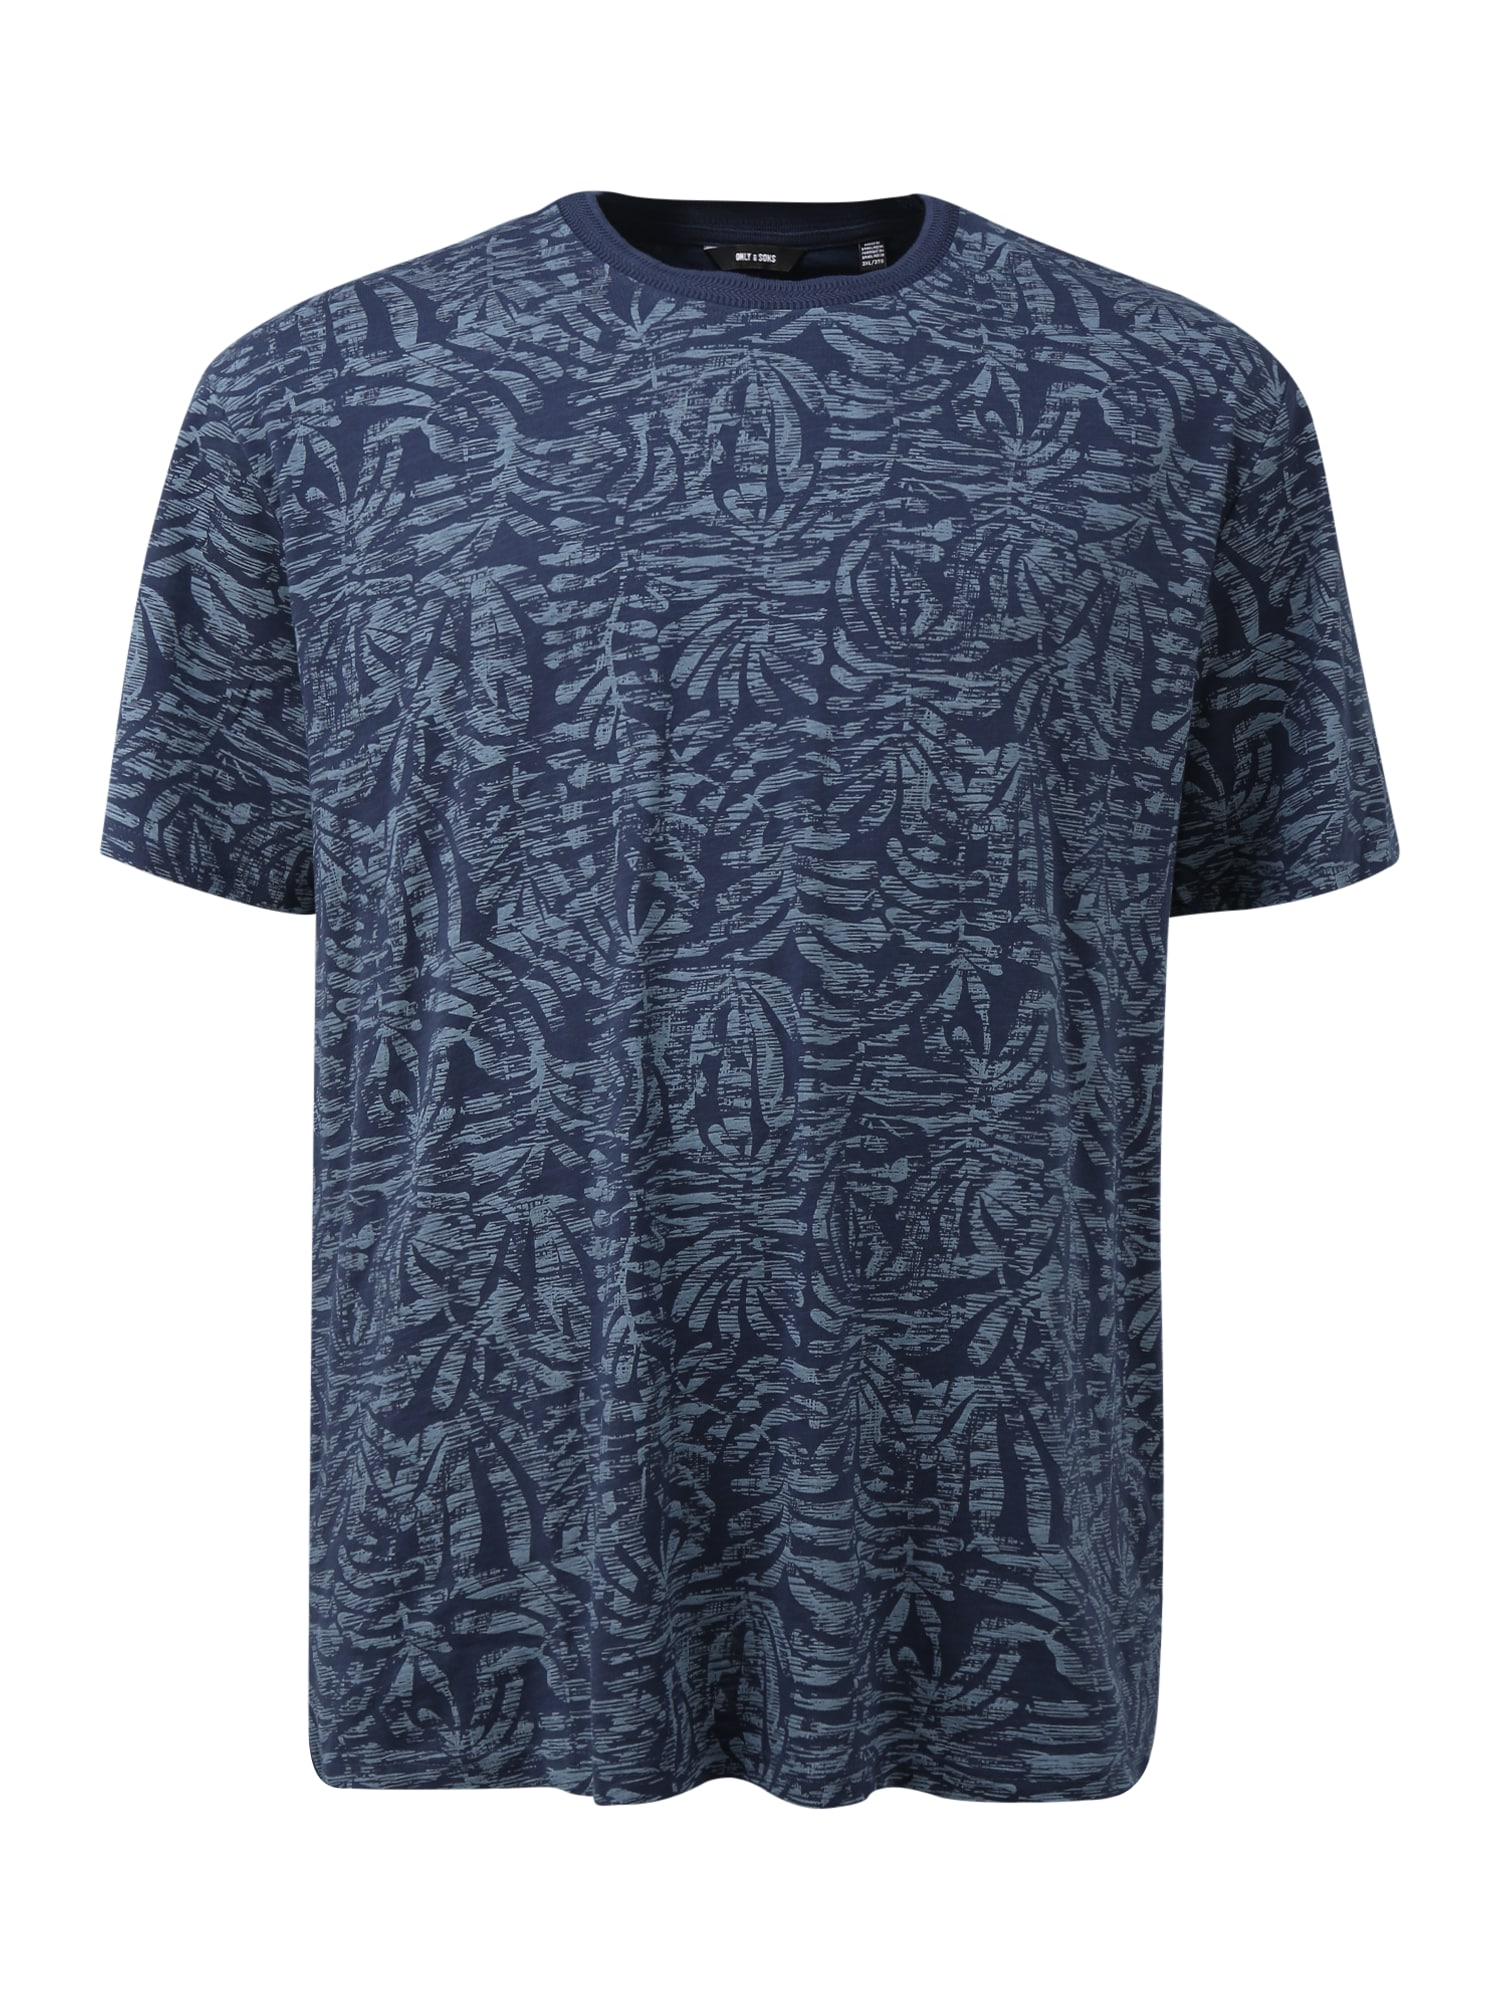 Only & Sons (Big & Tall) Marškinėliai